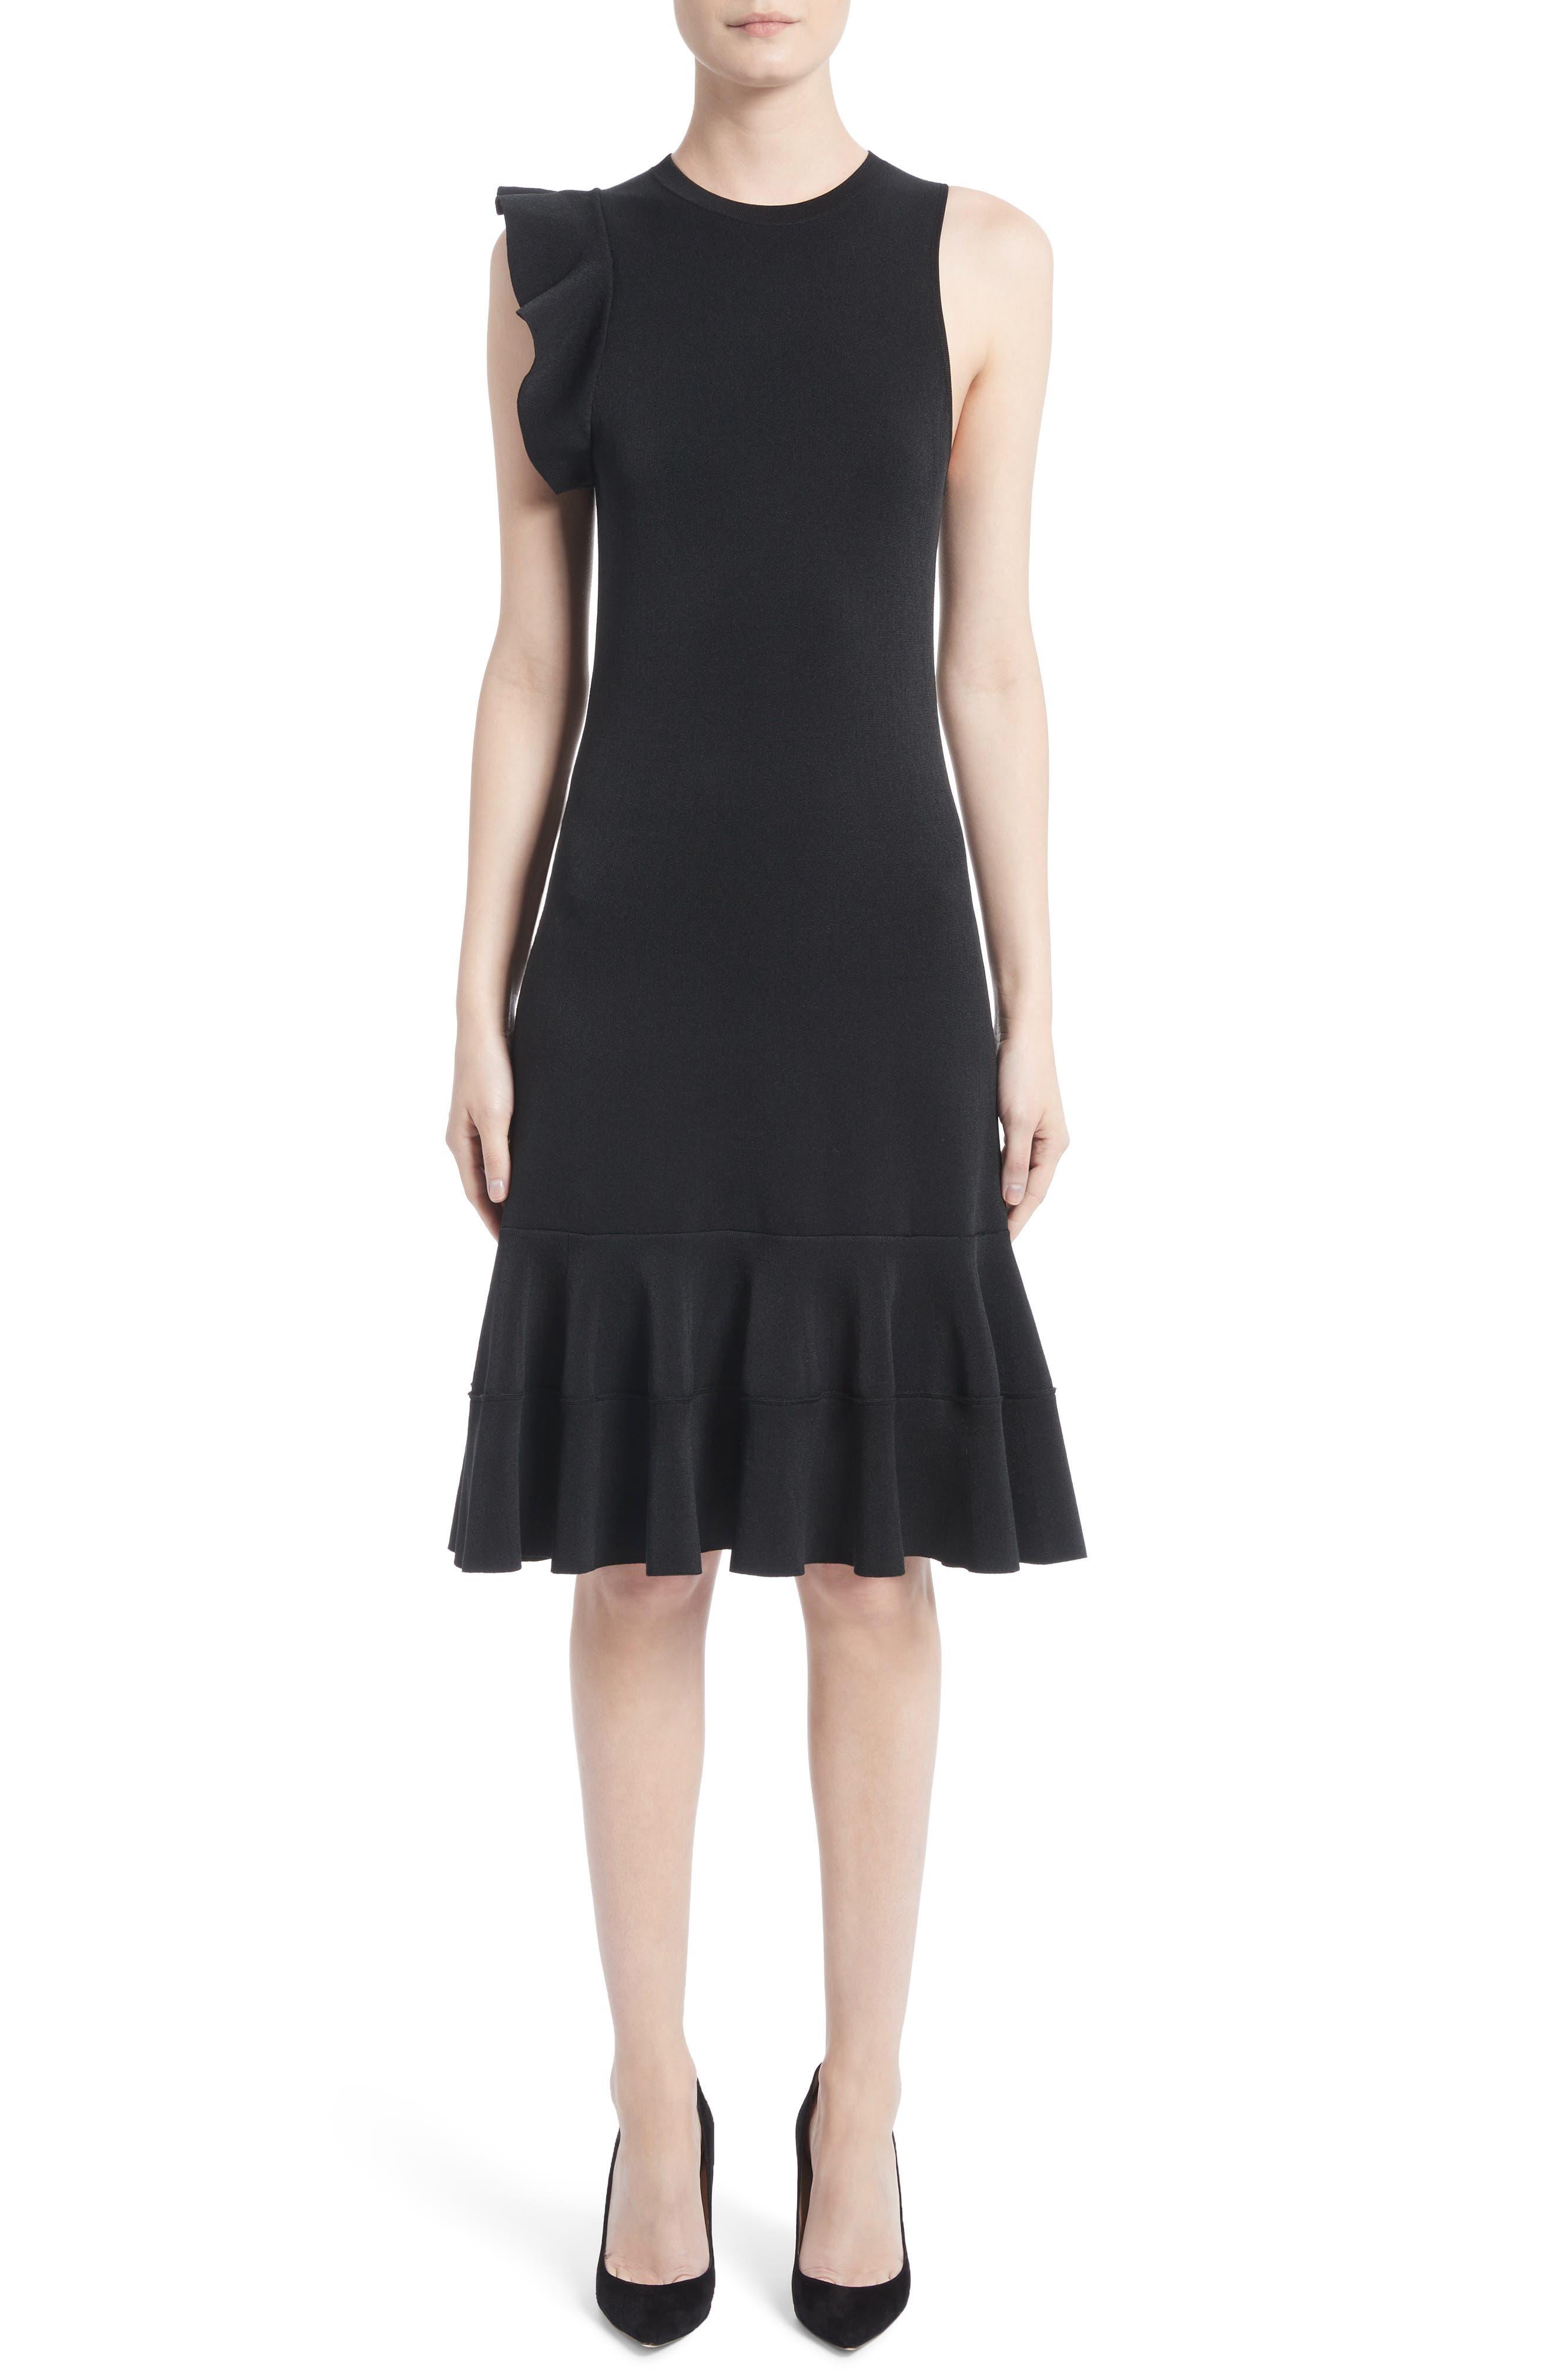 Alternate Image 1 Selected - Proenza Schouler One-Shoulder Ruffle Dress